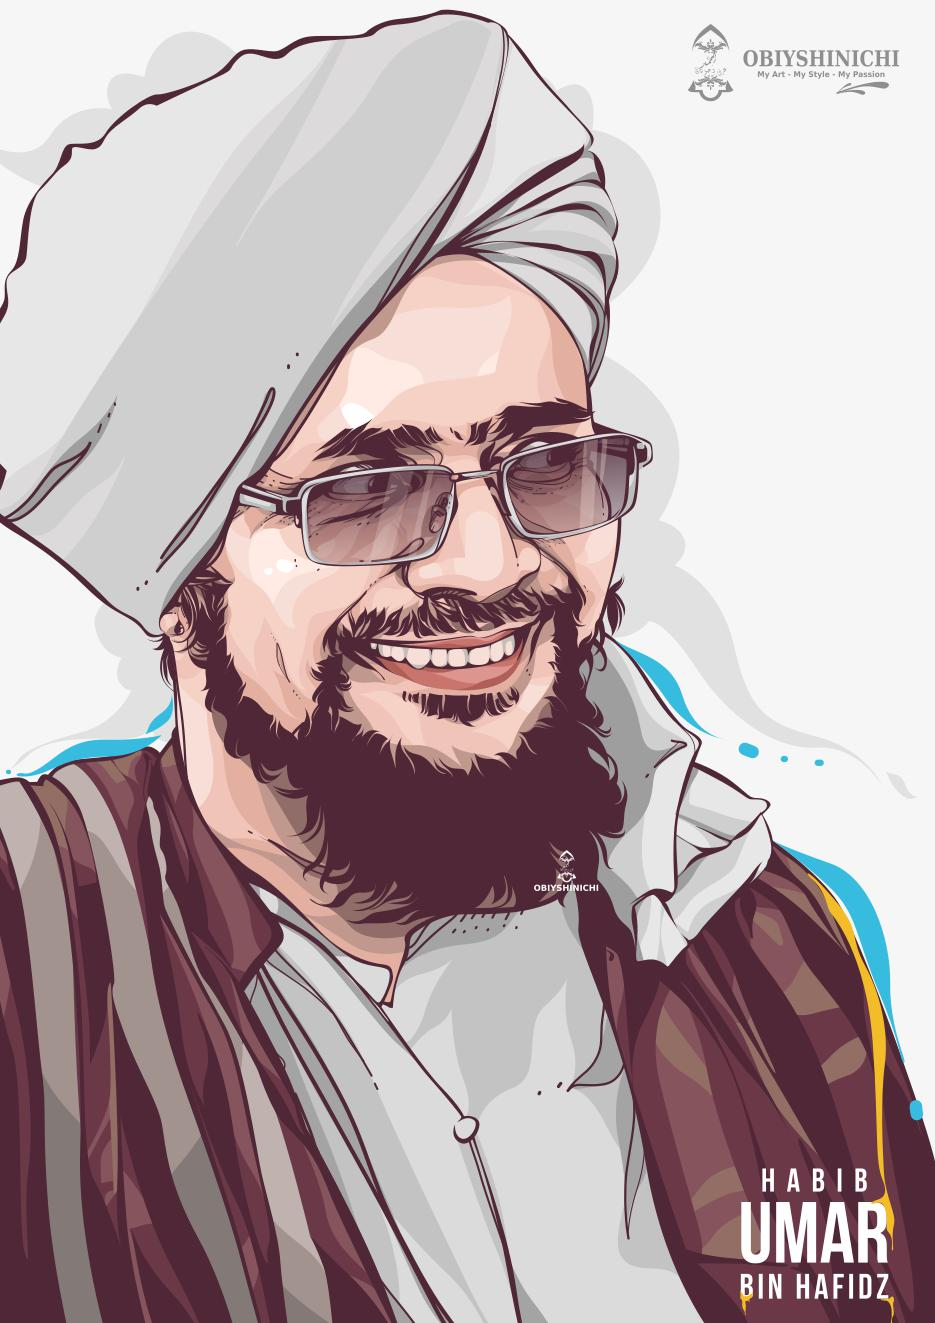 Habib Umar Bin Hafidz wallpaper (7 Wallpapers) - Adorable ...